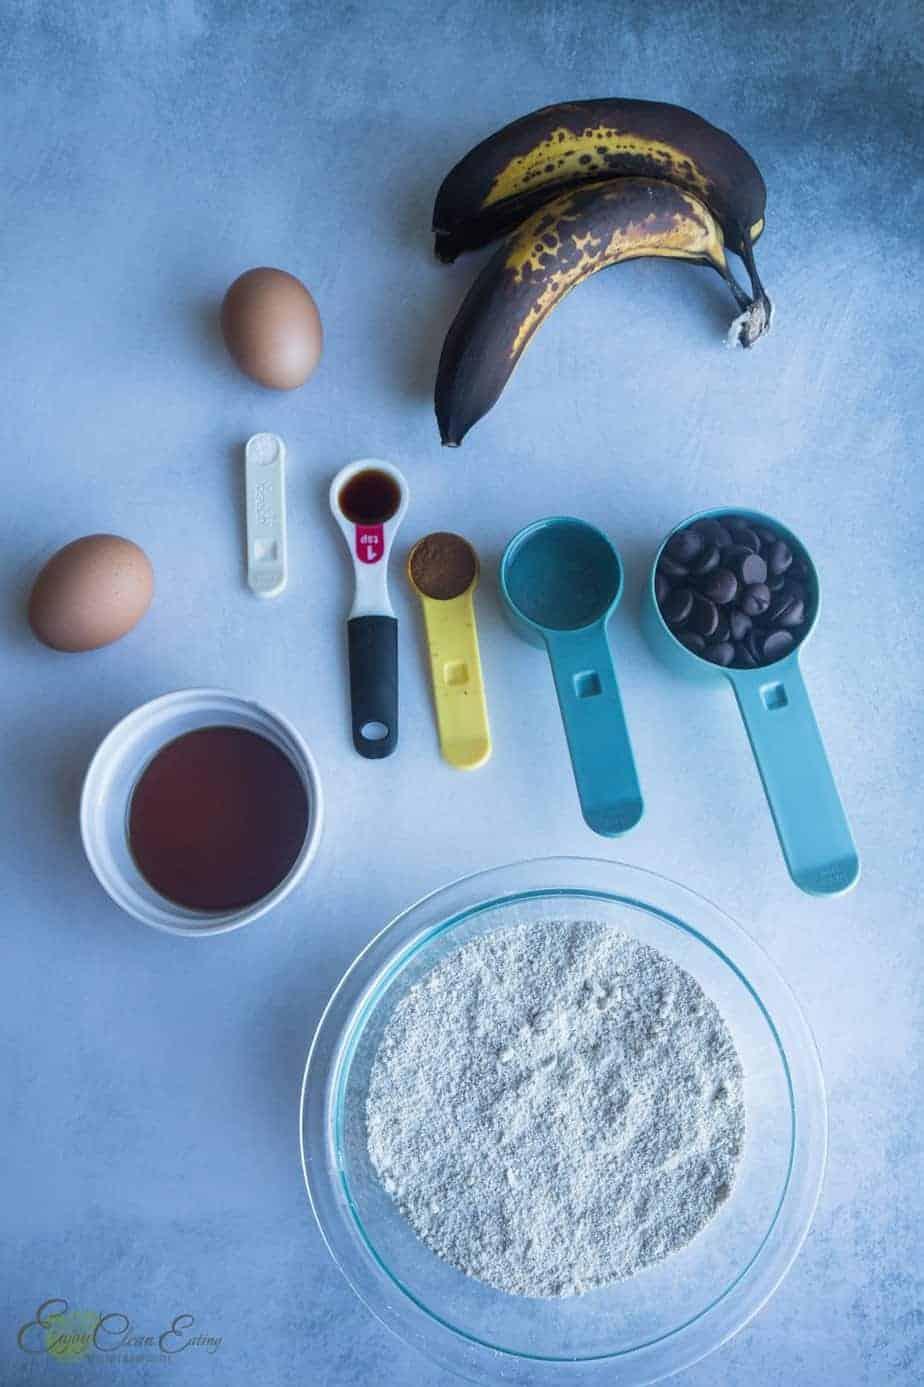 ingredients to make banana oatmeal cupcakes